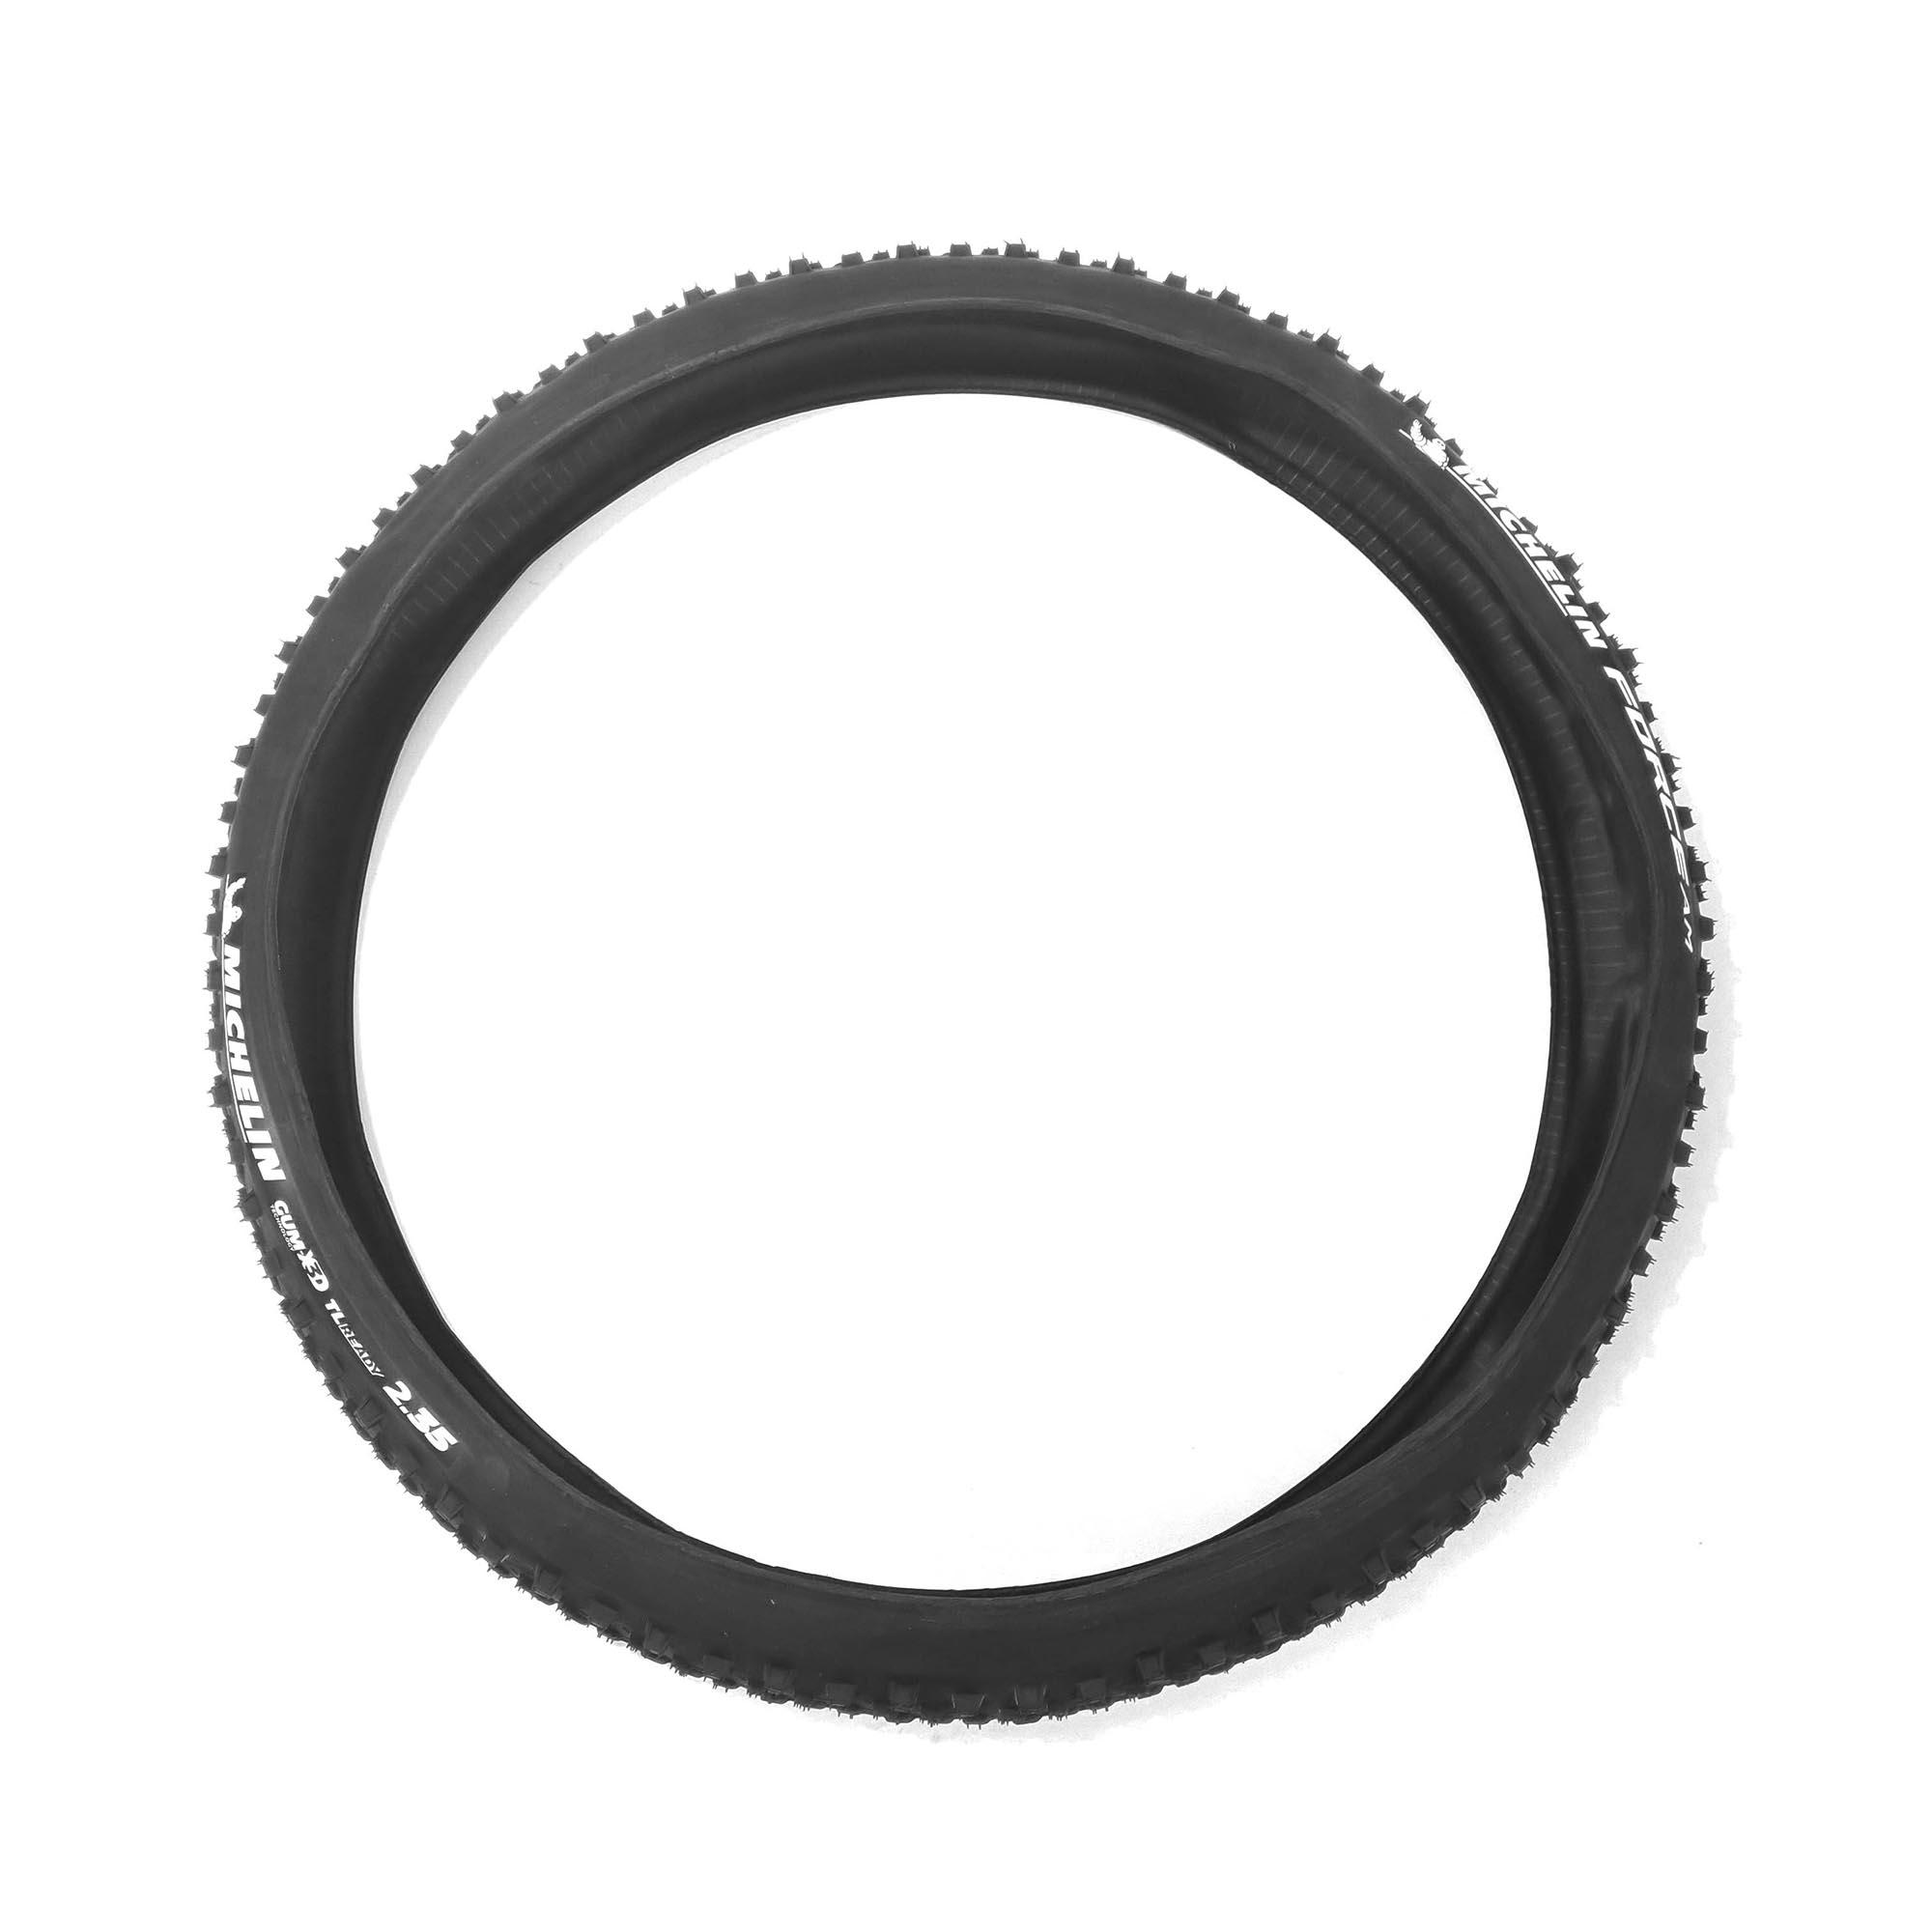 Pneu de Bicicleta Aro 29 Michelin Force Am Terrain Hard/Dry 29X2.35 58-622